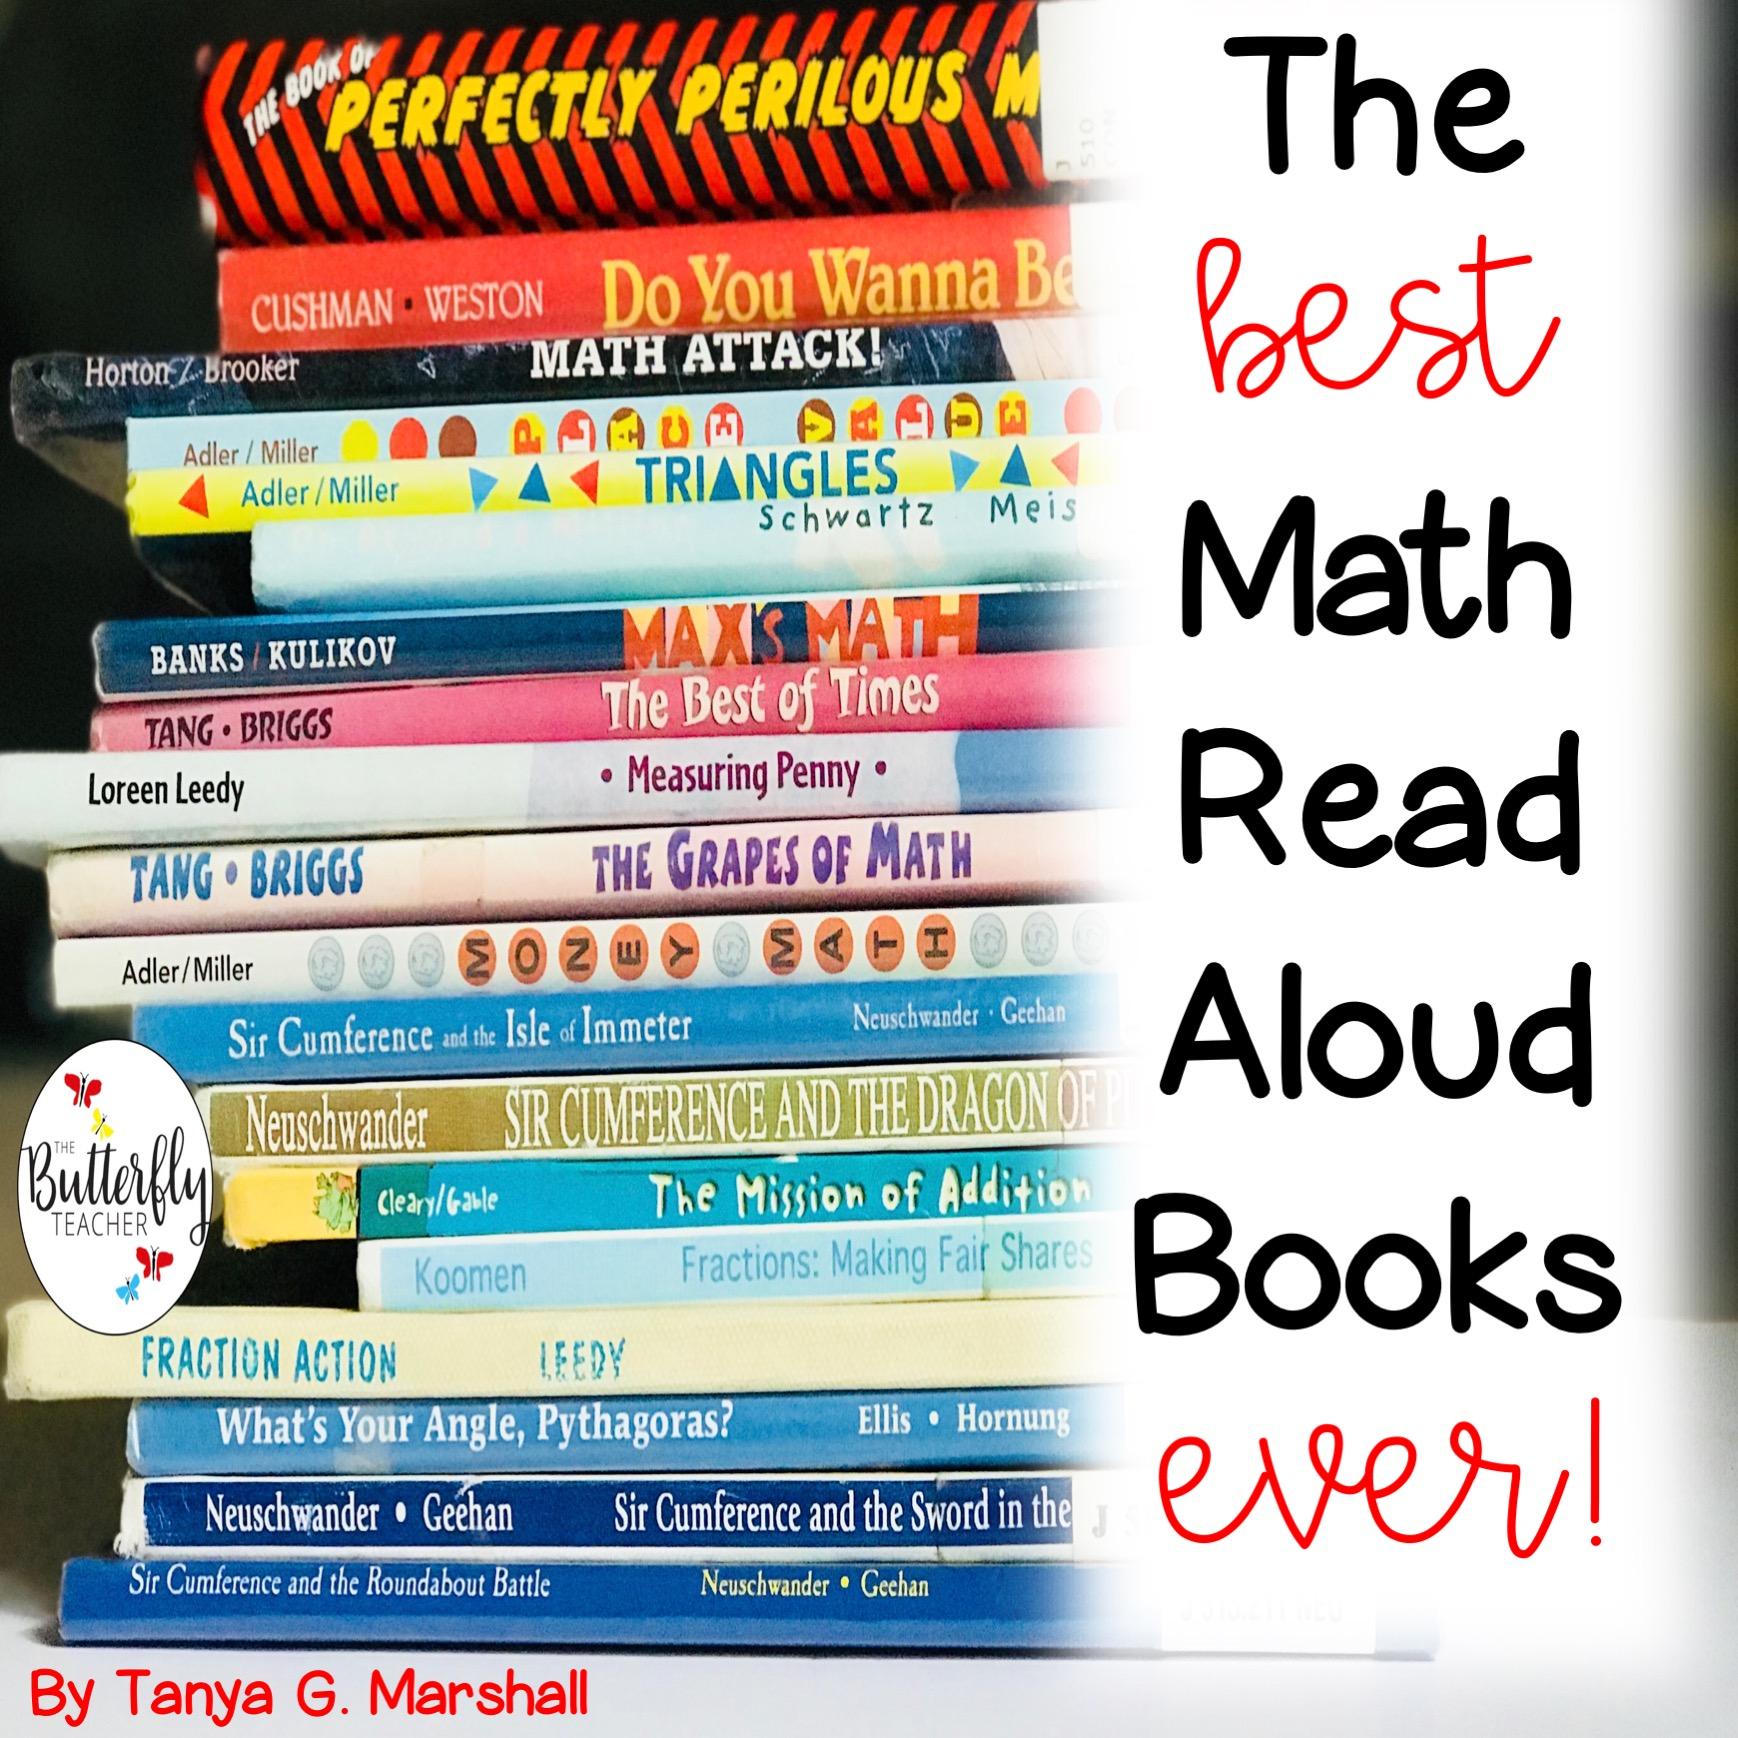 Math-Read-Aloud-Post-Pic-1 Teachers Pay Newsletter Templates on